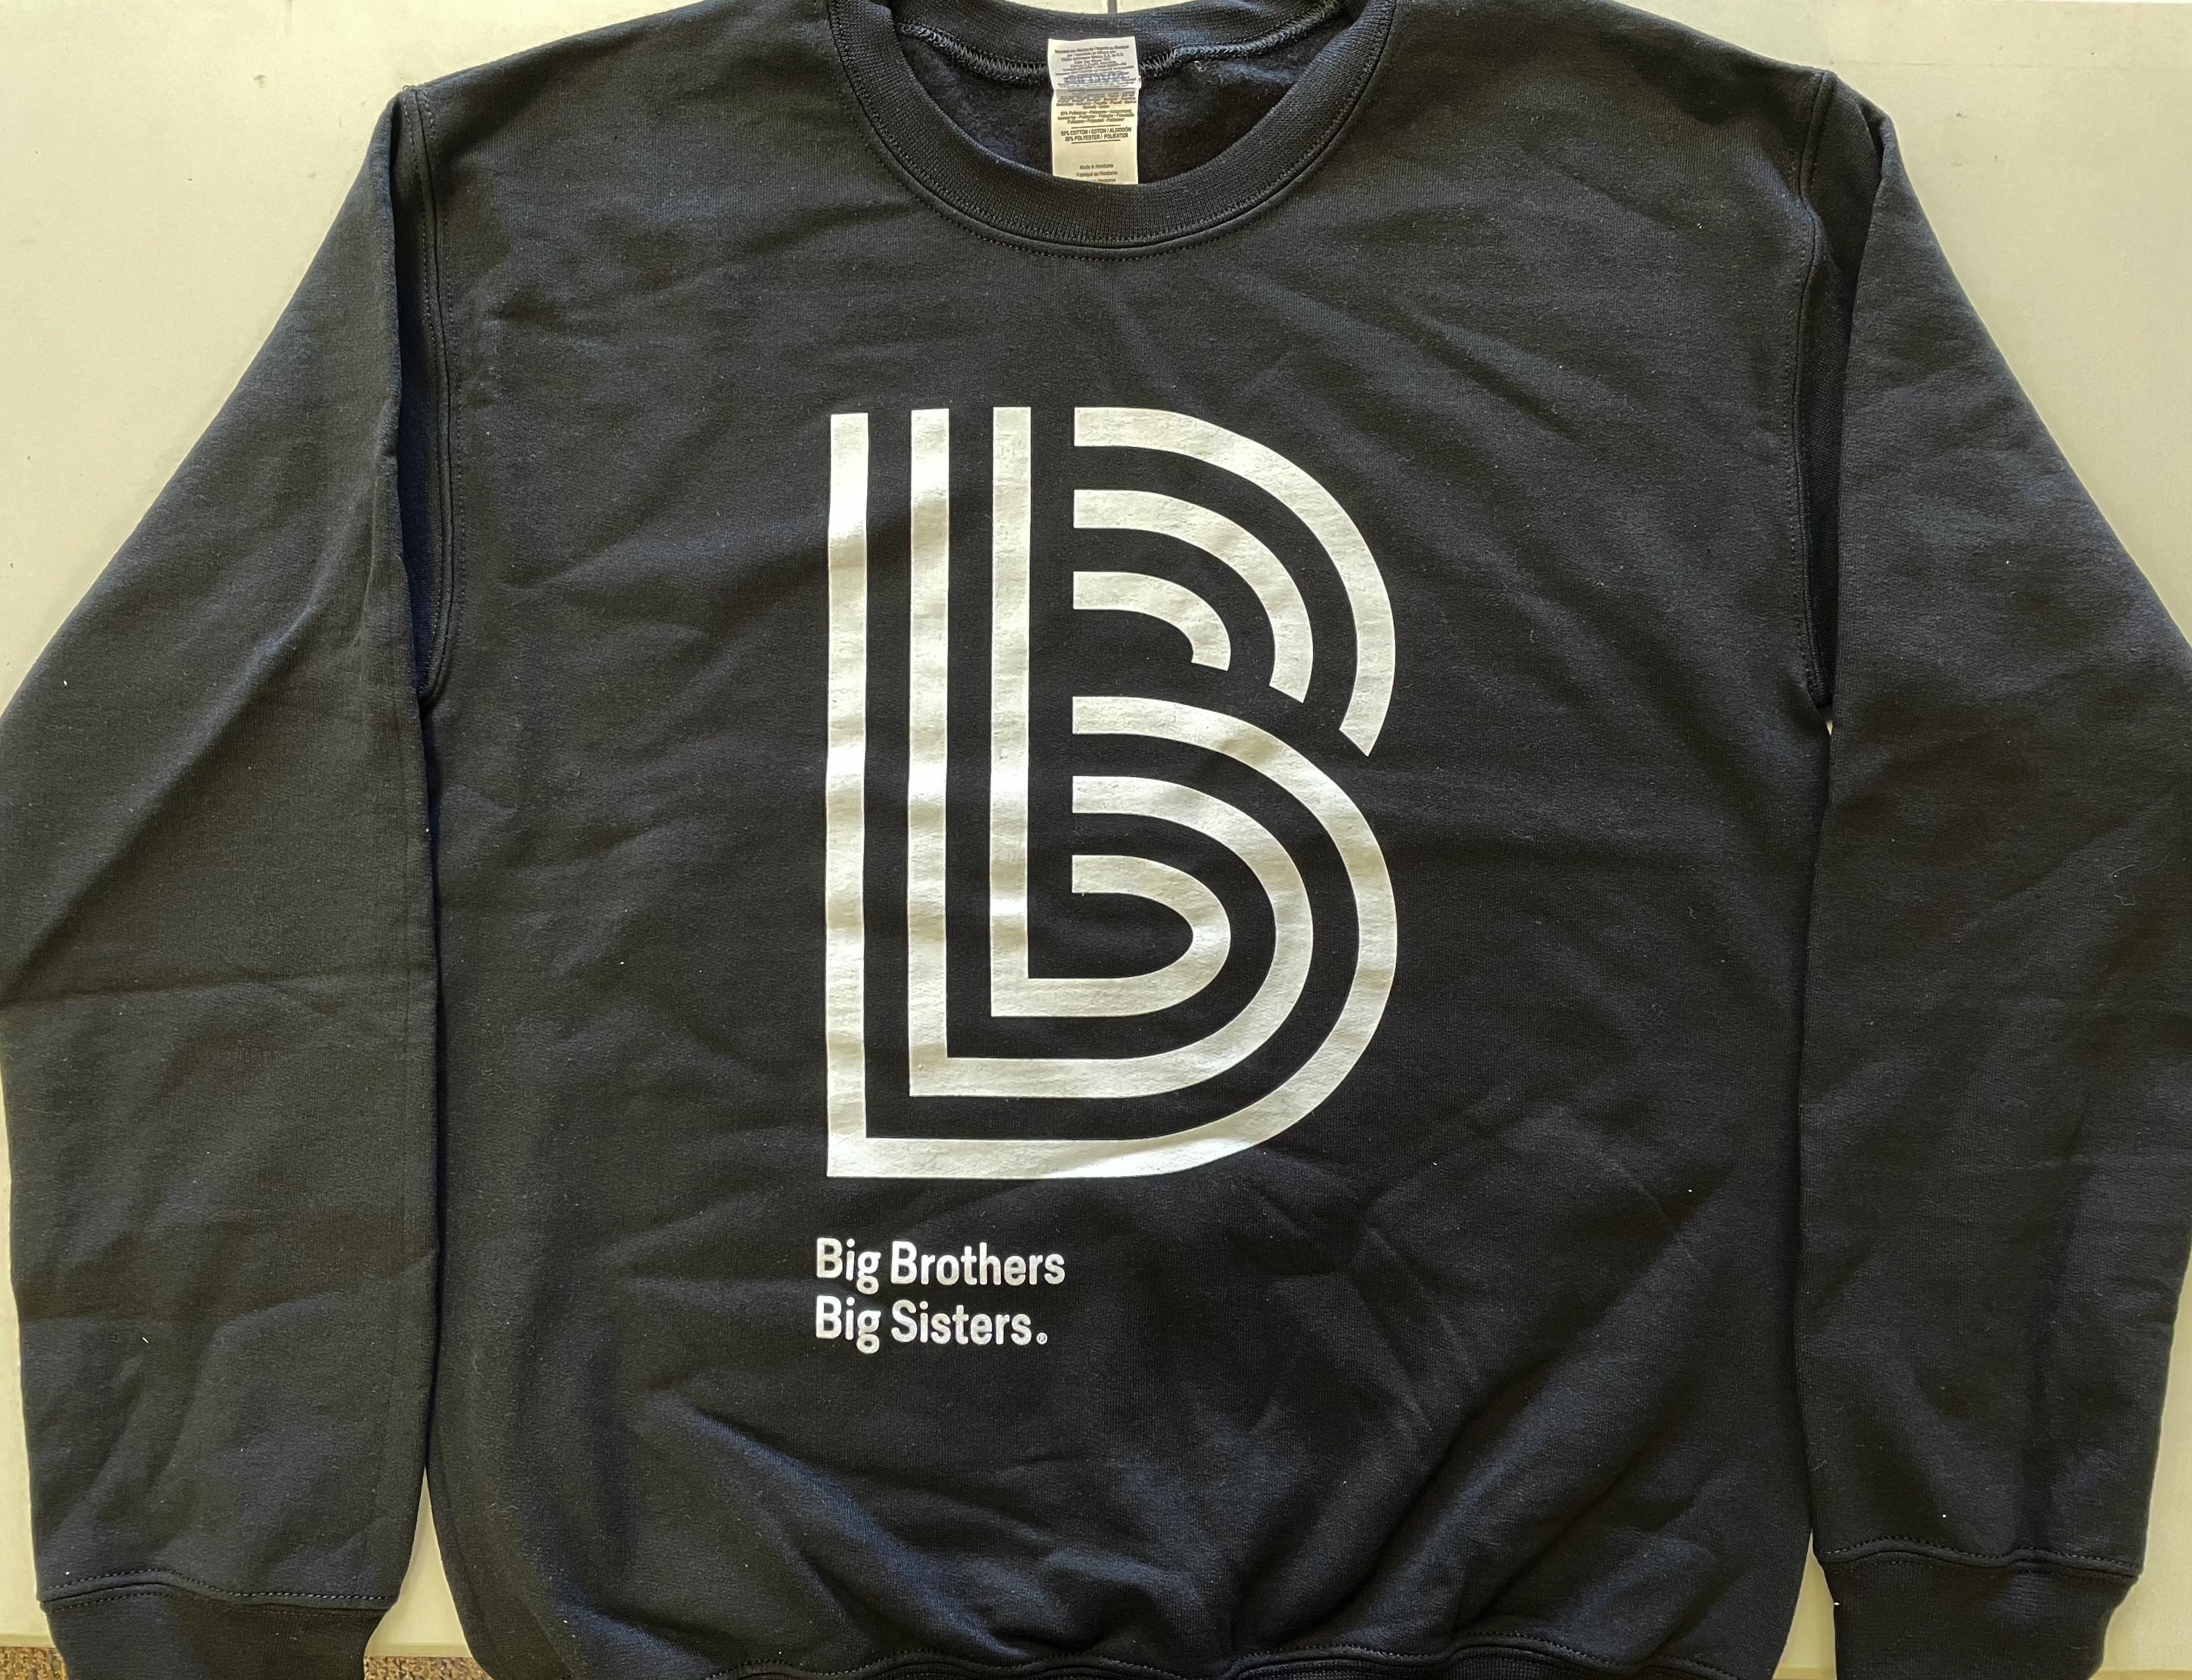 Black Adult Crewneck Sweatshirt (SMALL)